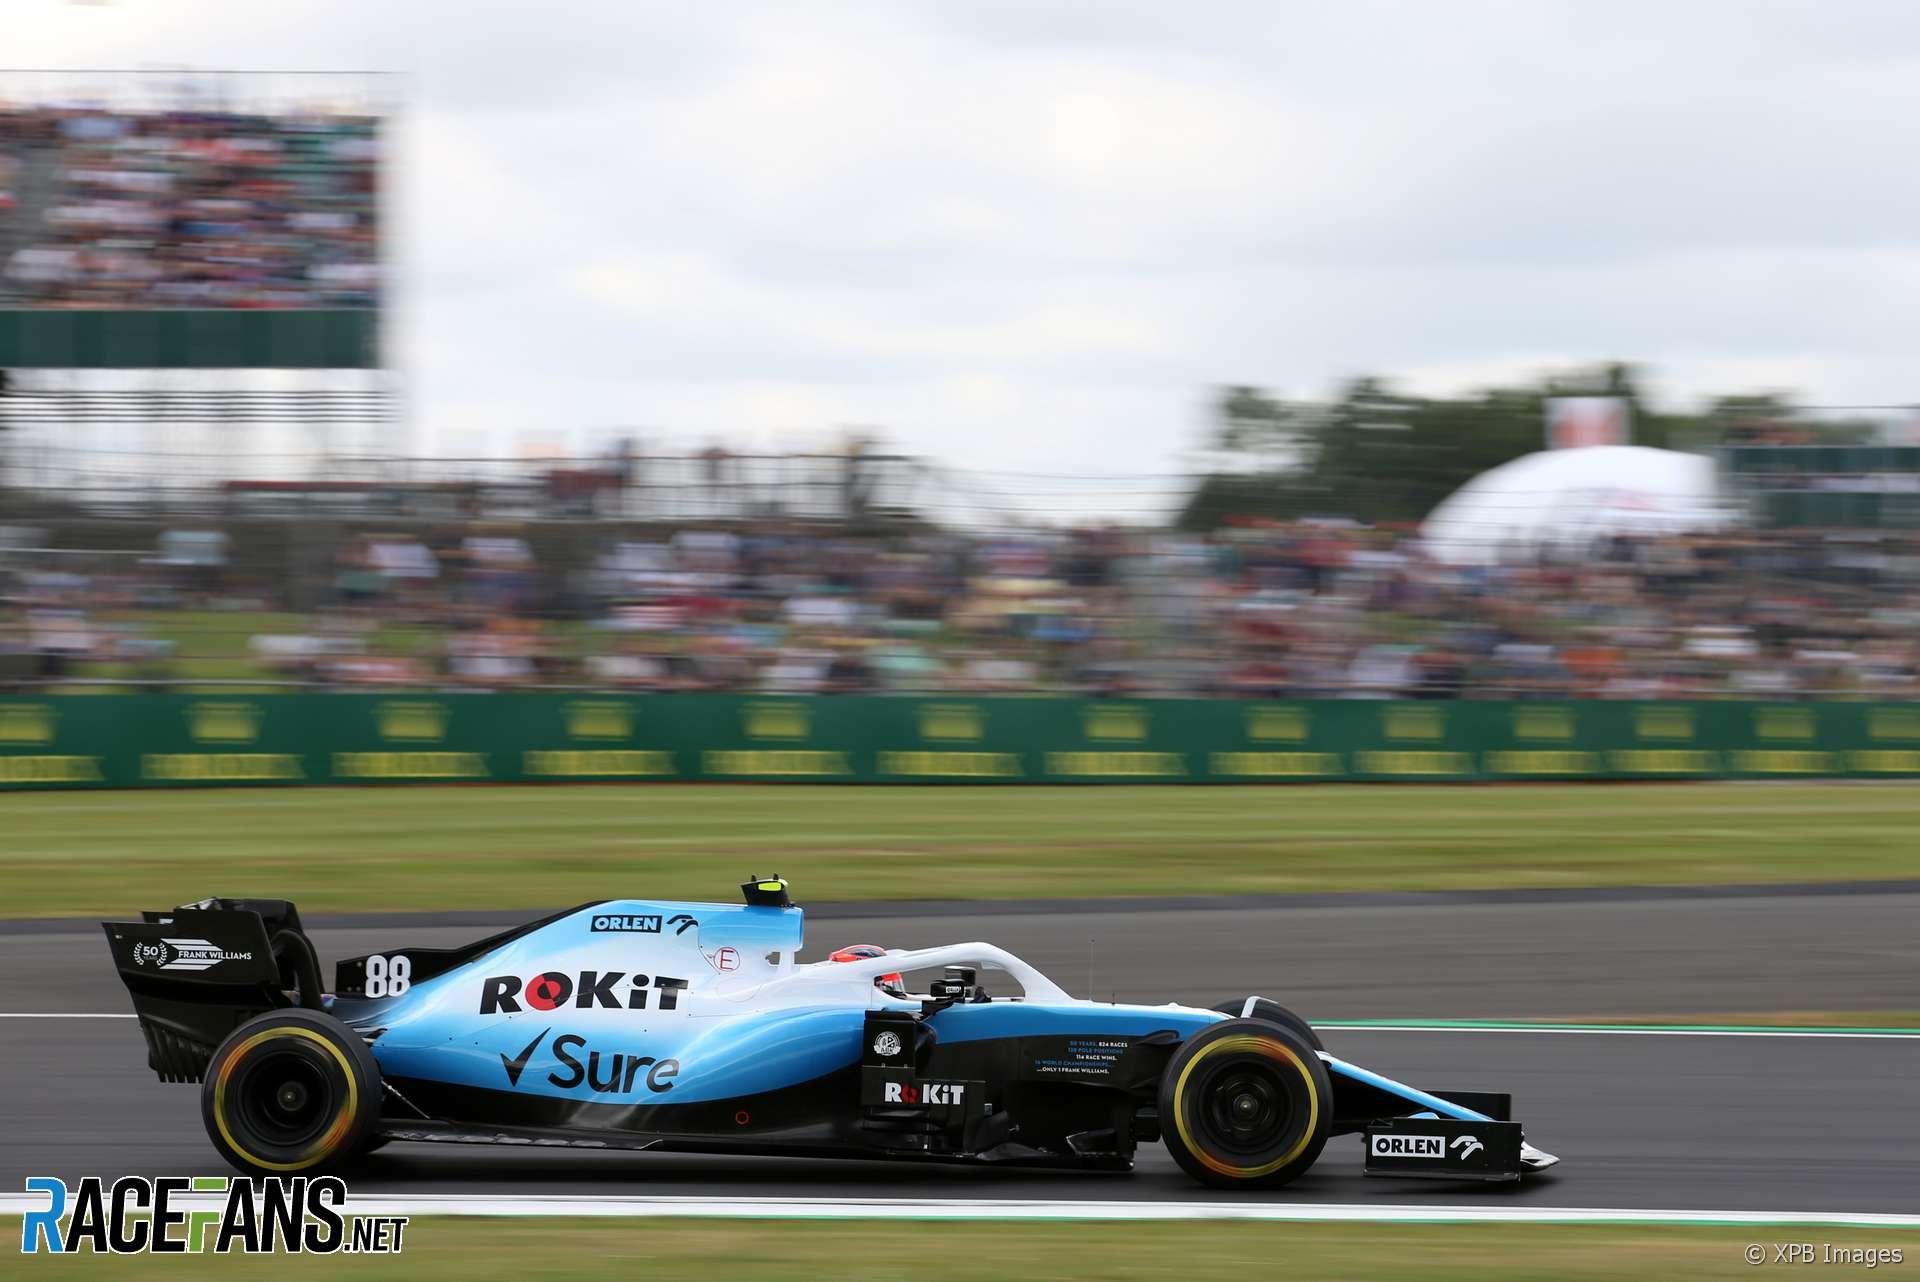 Robert Kubica, Williams, Silverstone, 2019